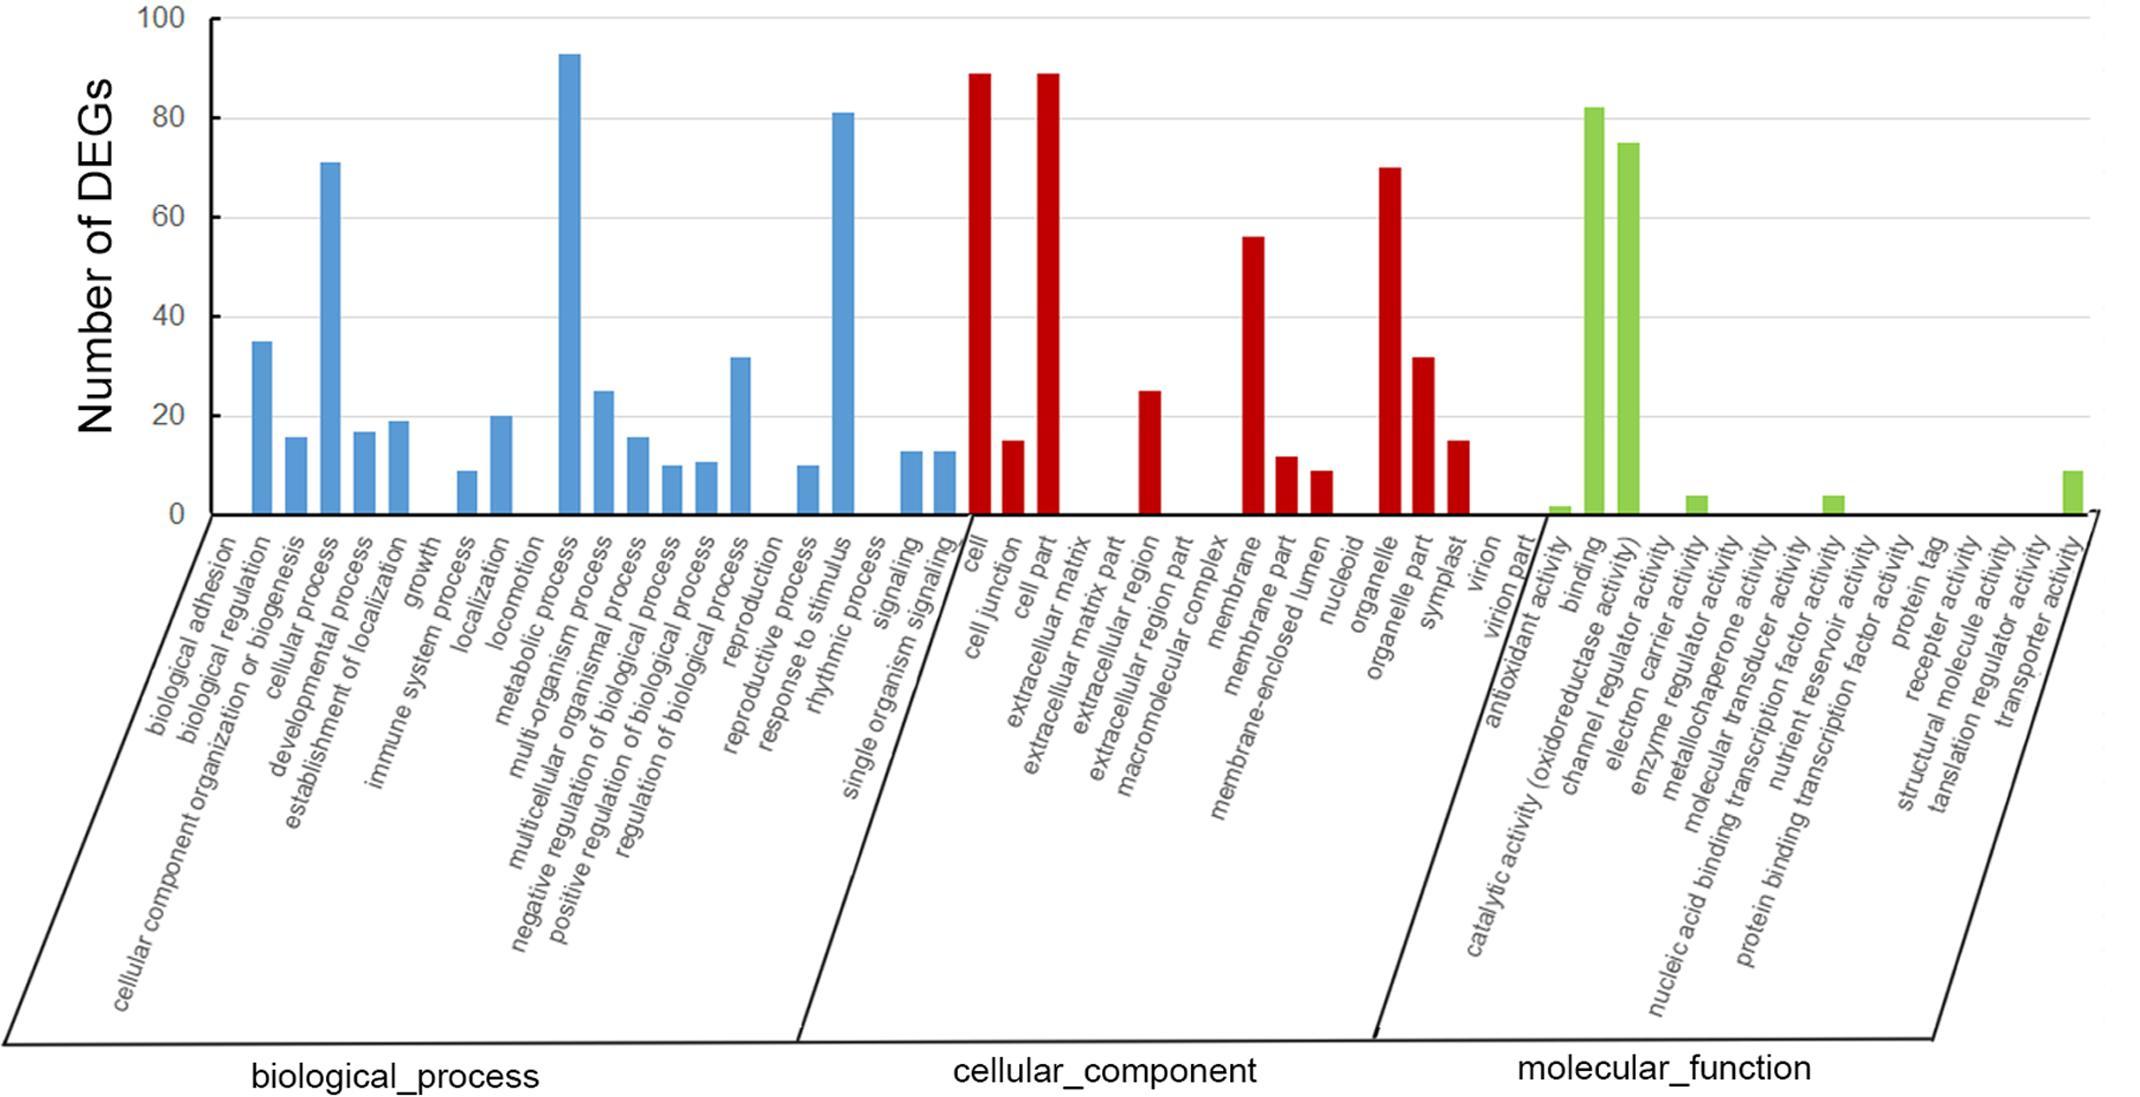 An analysis of ontology